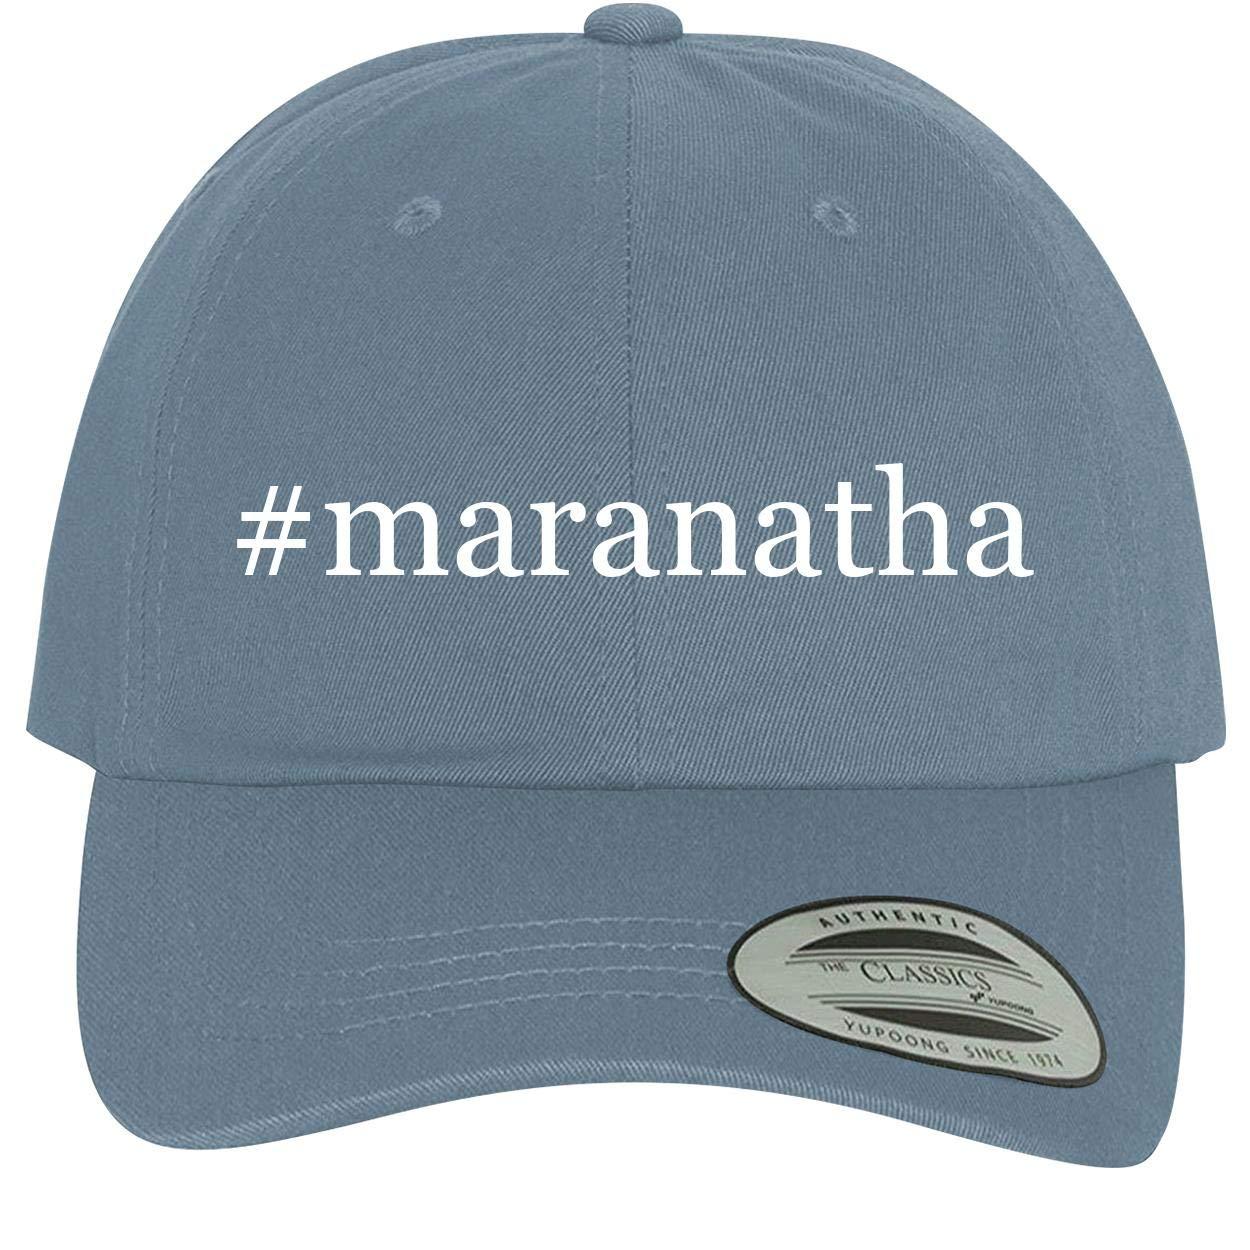 Comfortable Dad Hat Baseball Cap BH Cool Designs #Maranatha